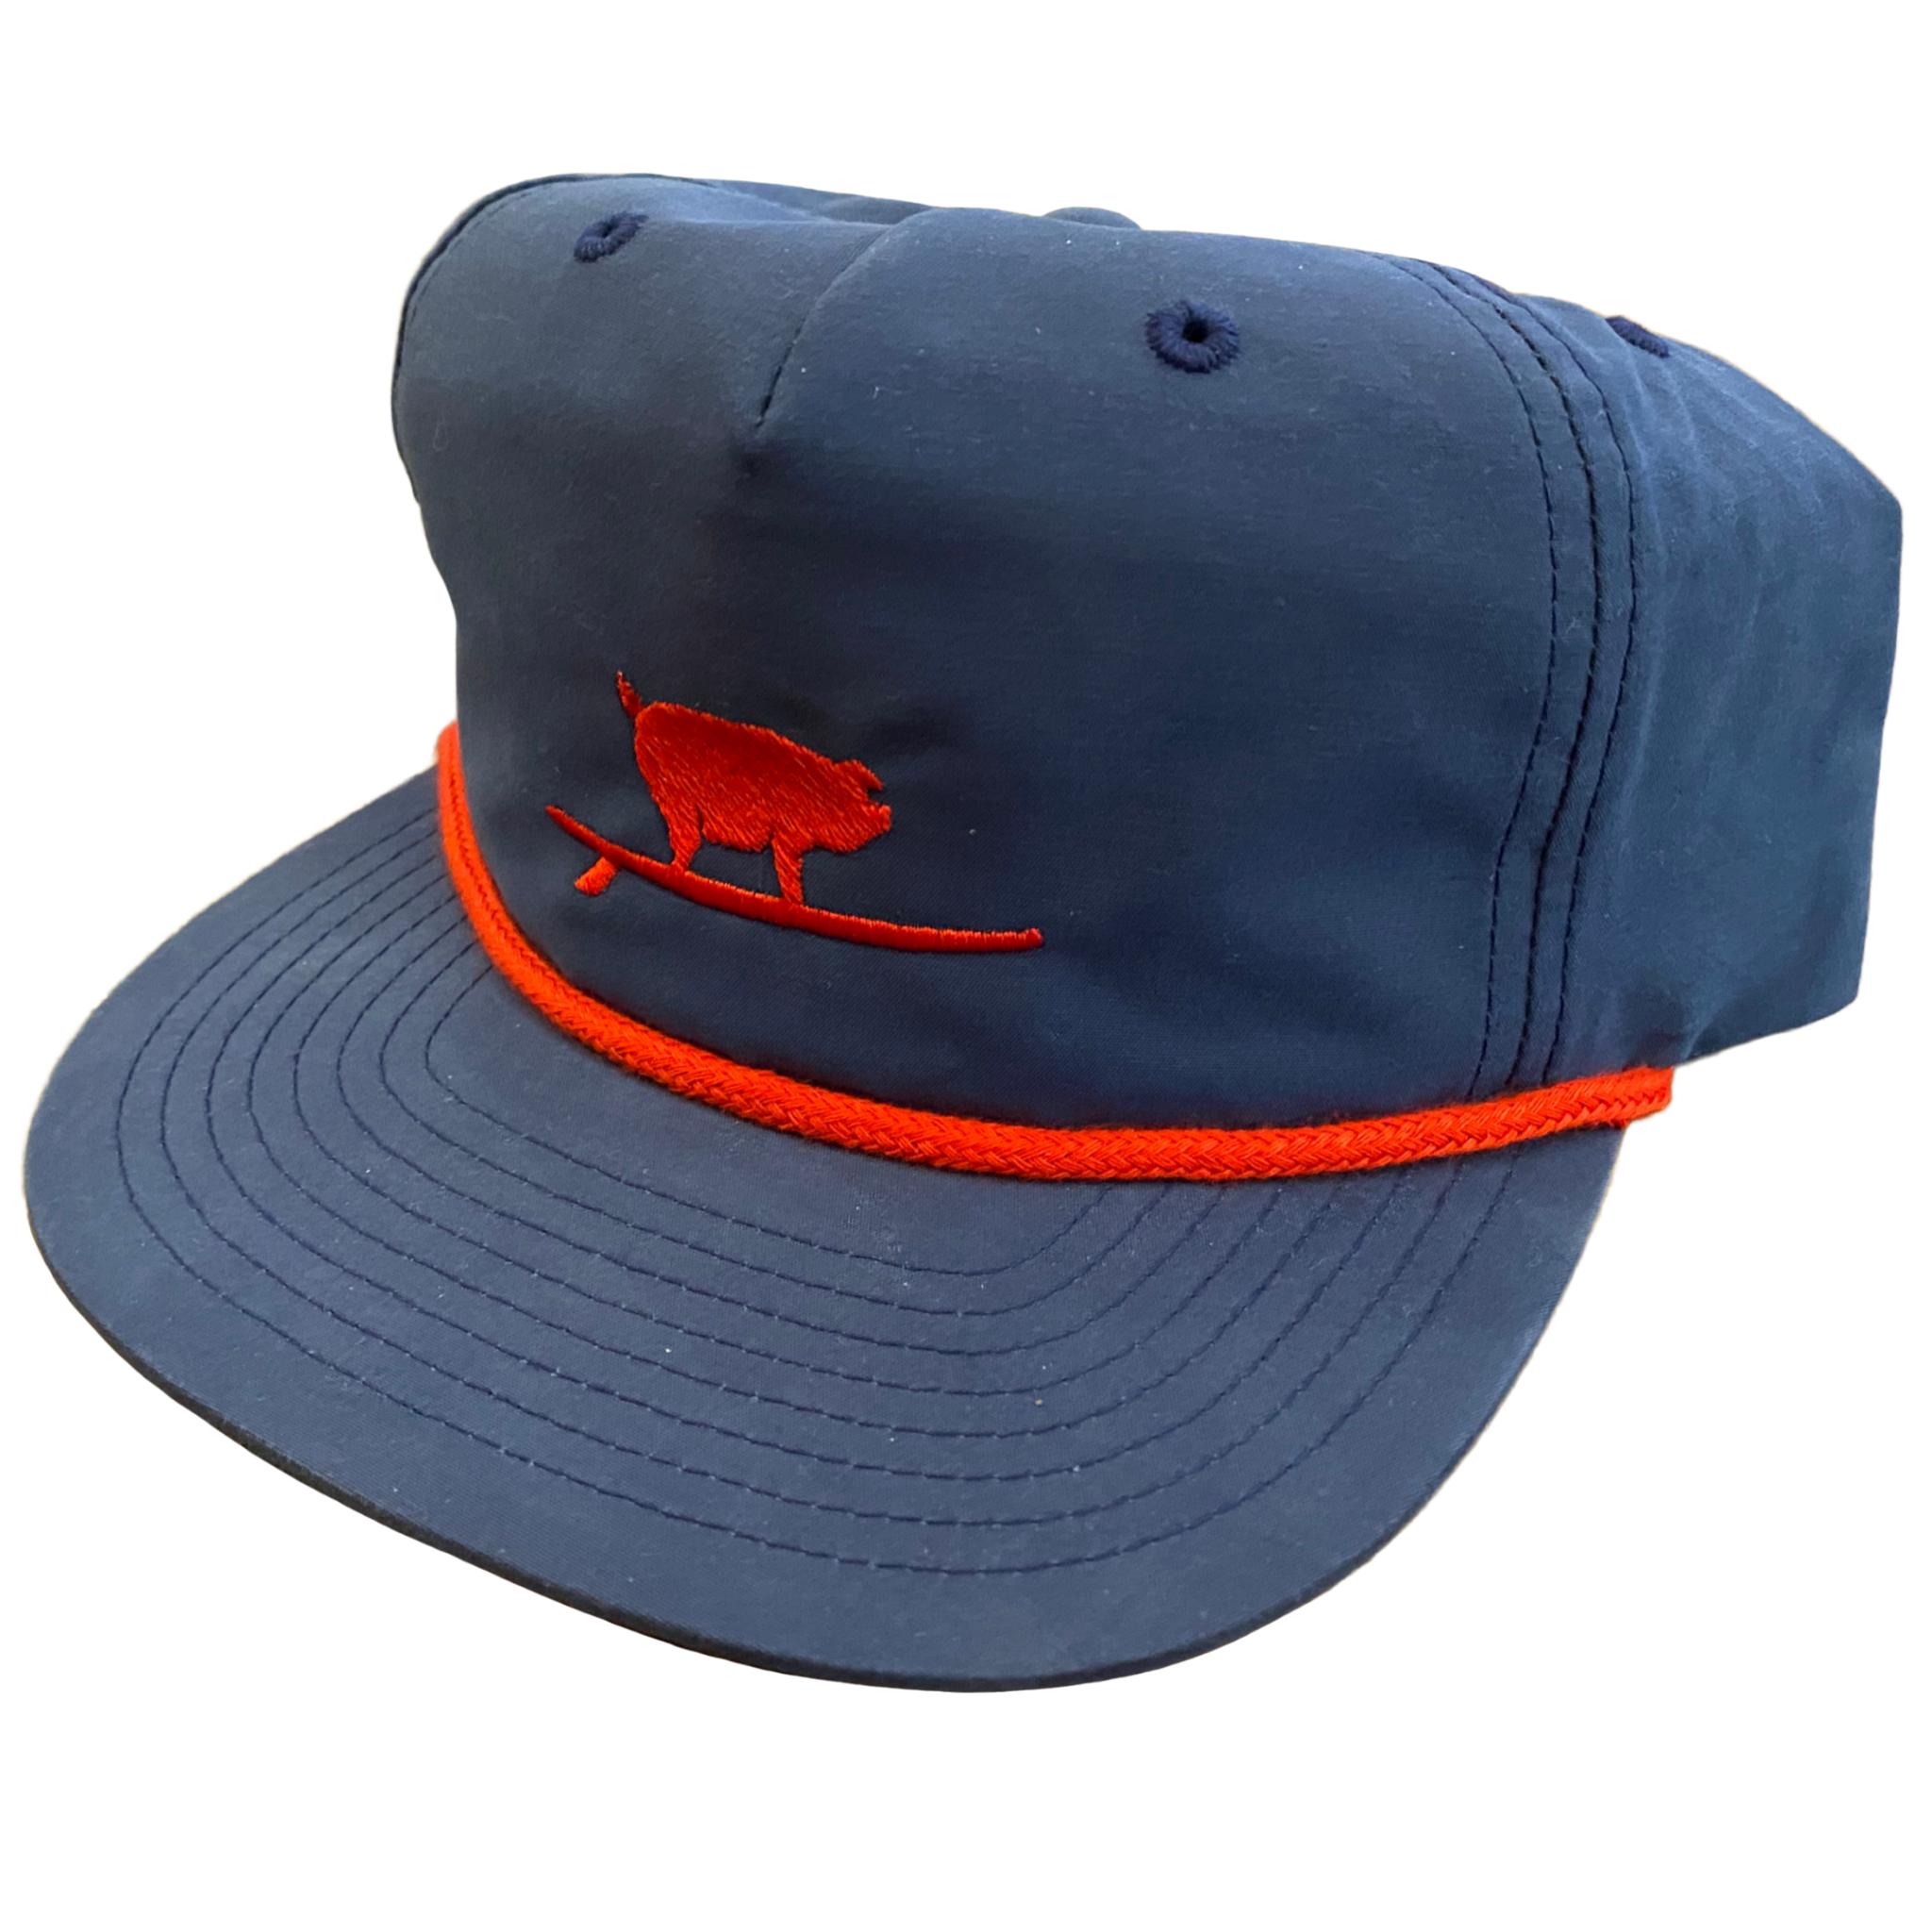 S.L. Revival Co. Surfing Pig Captain's Flatbrim Hat, Navy/Red